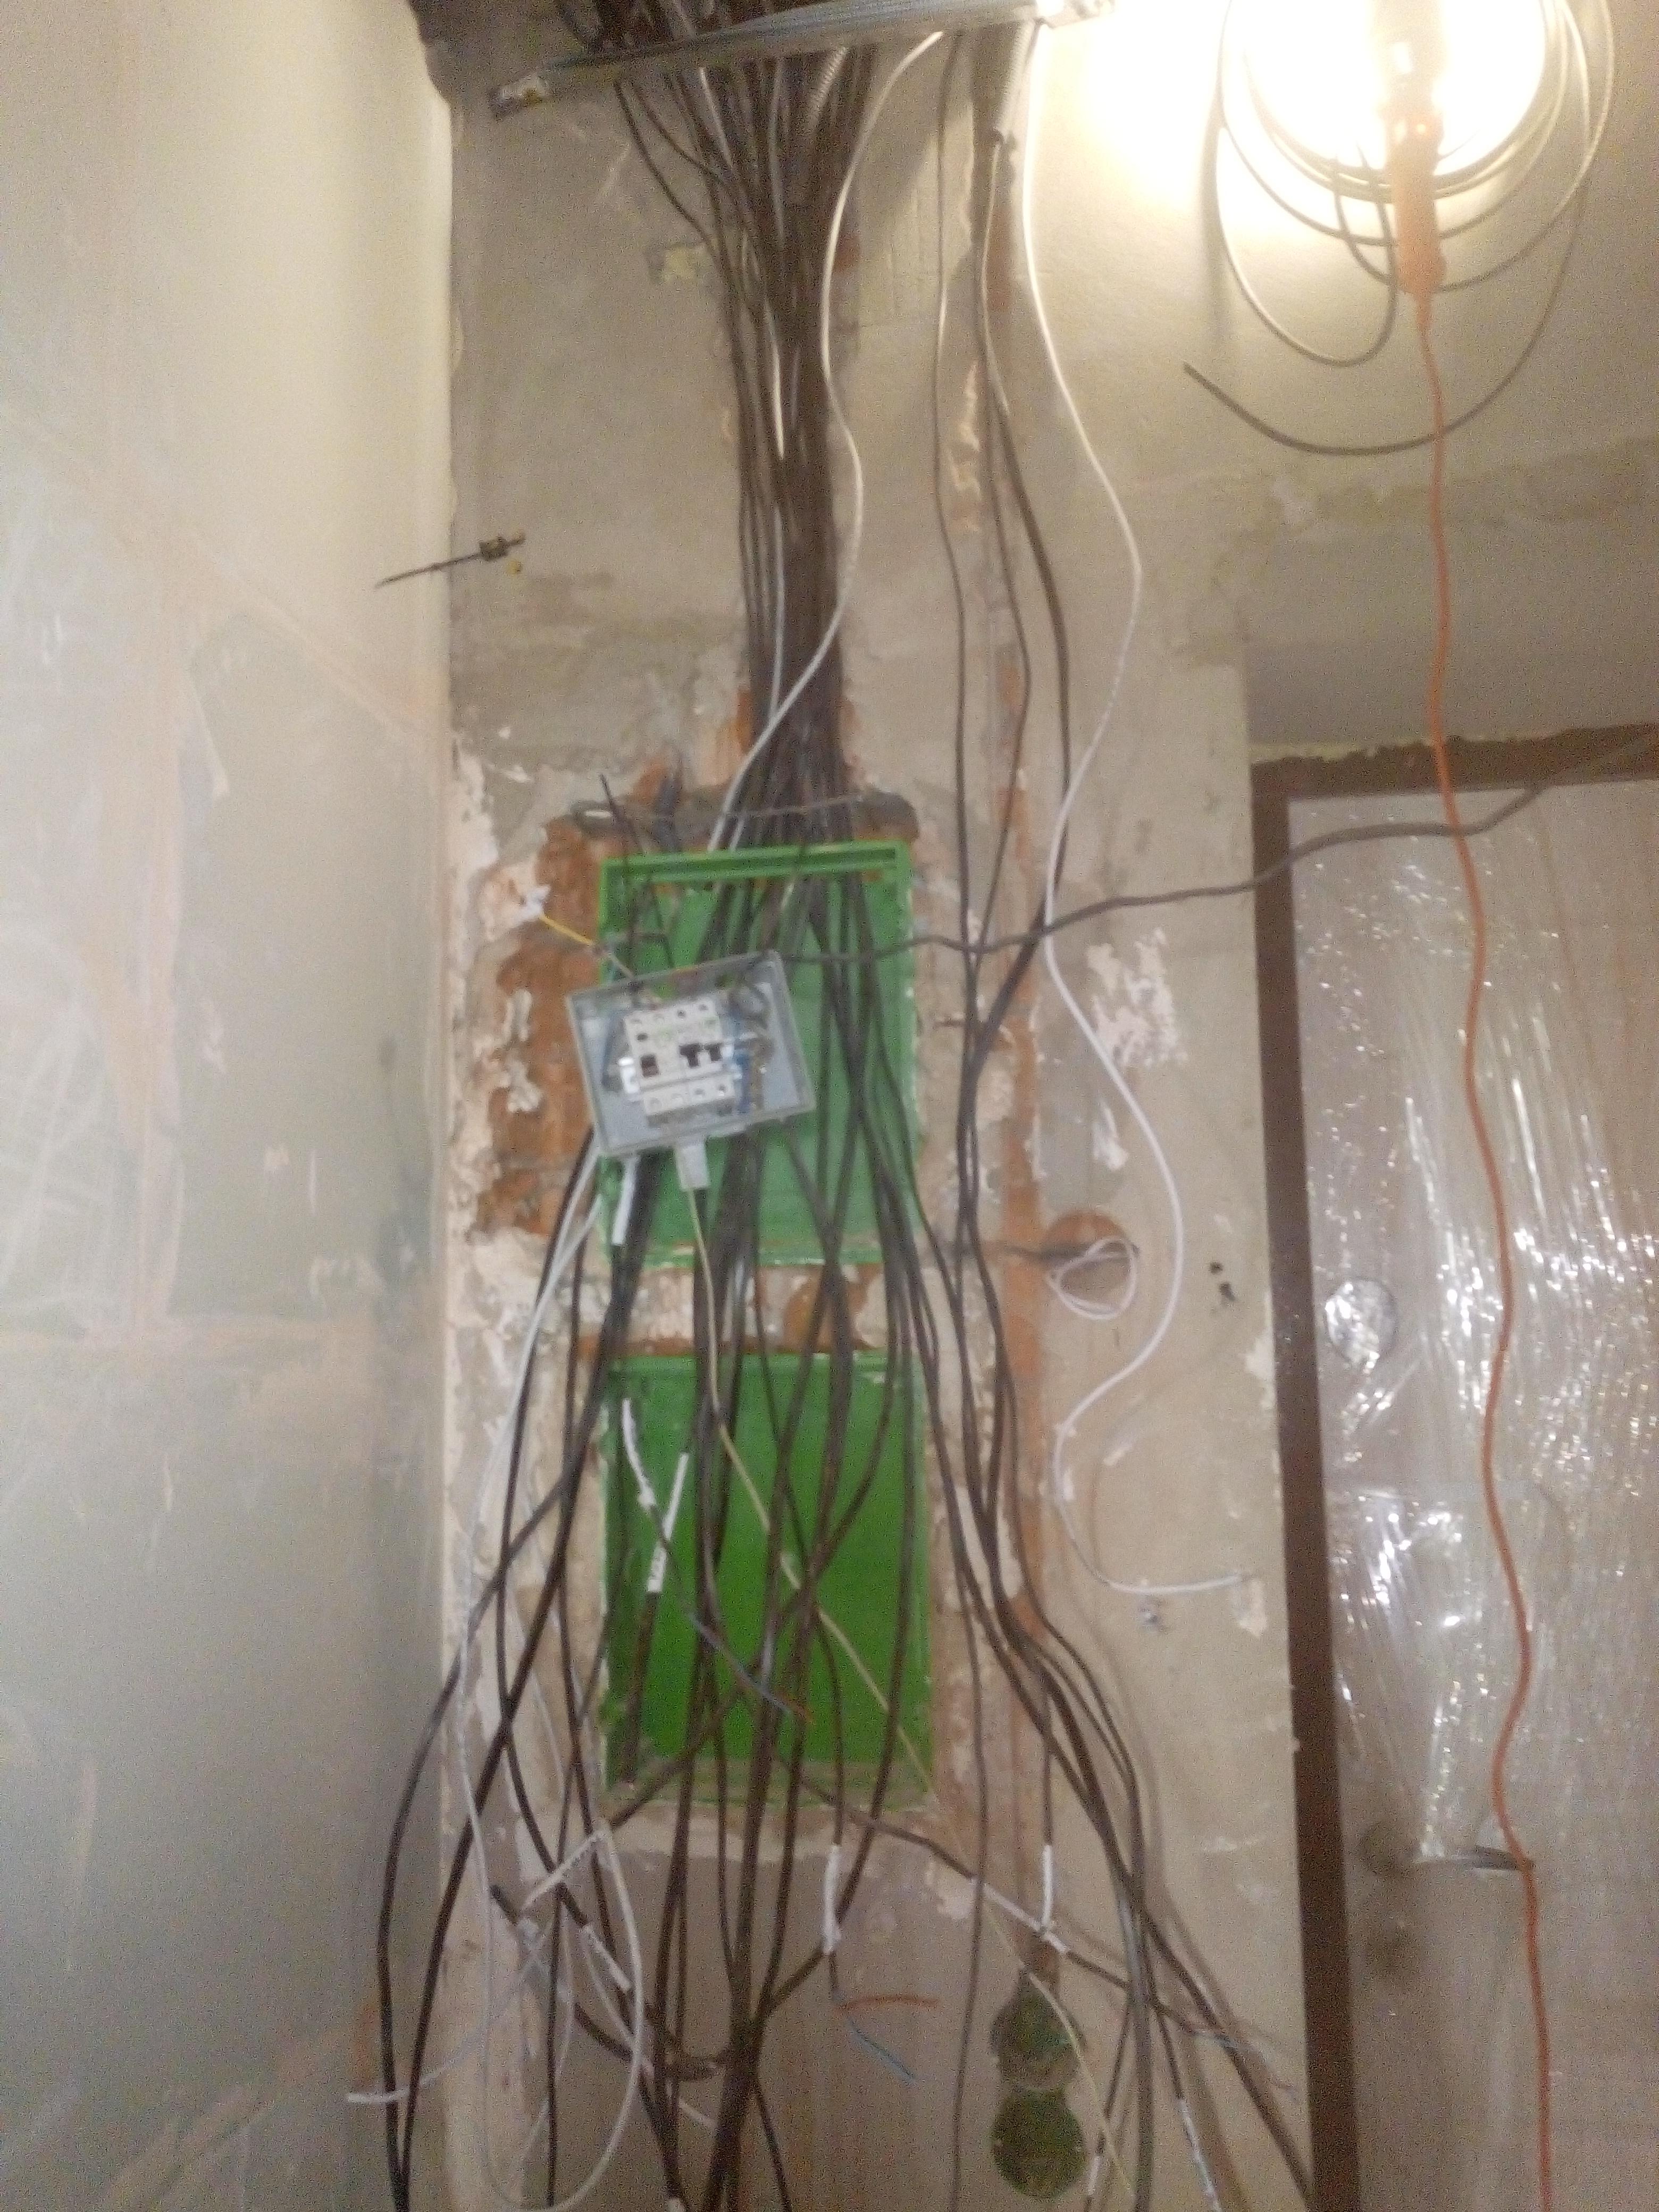 Фото Завершение работ на объекте, сборка щитка электрического